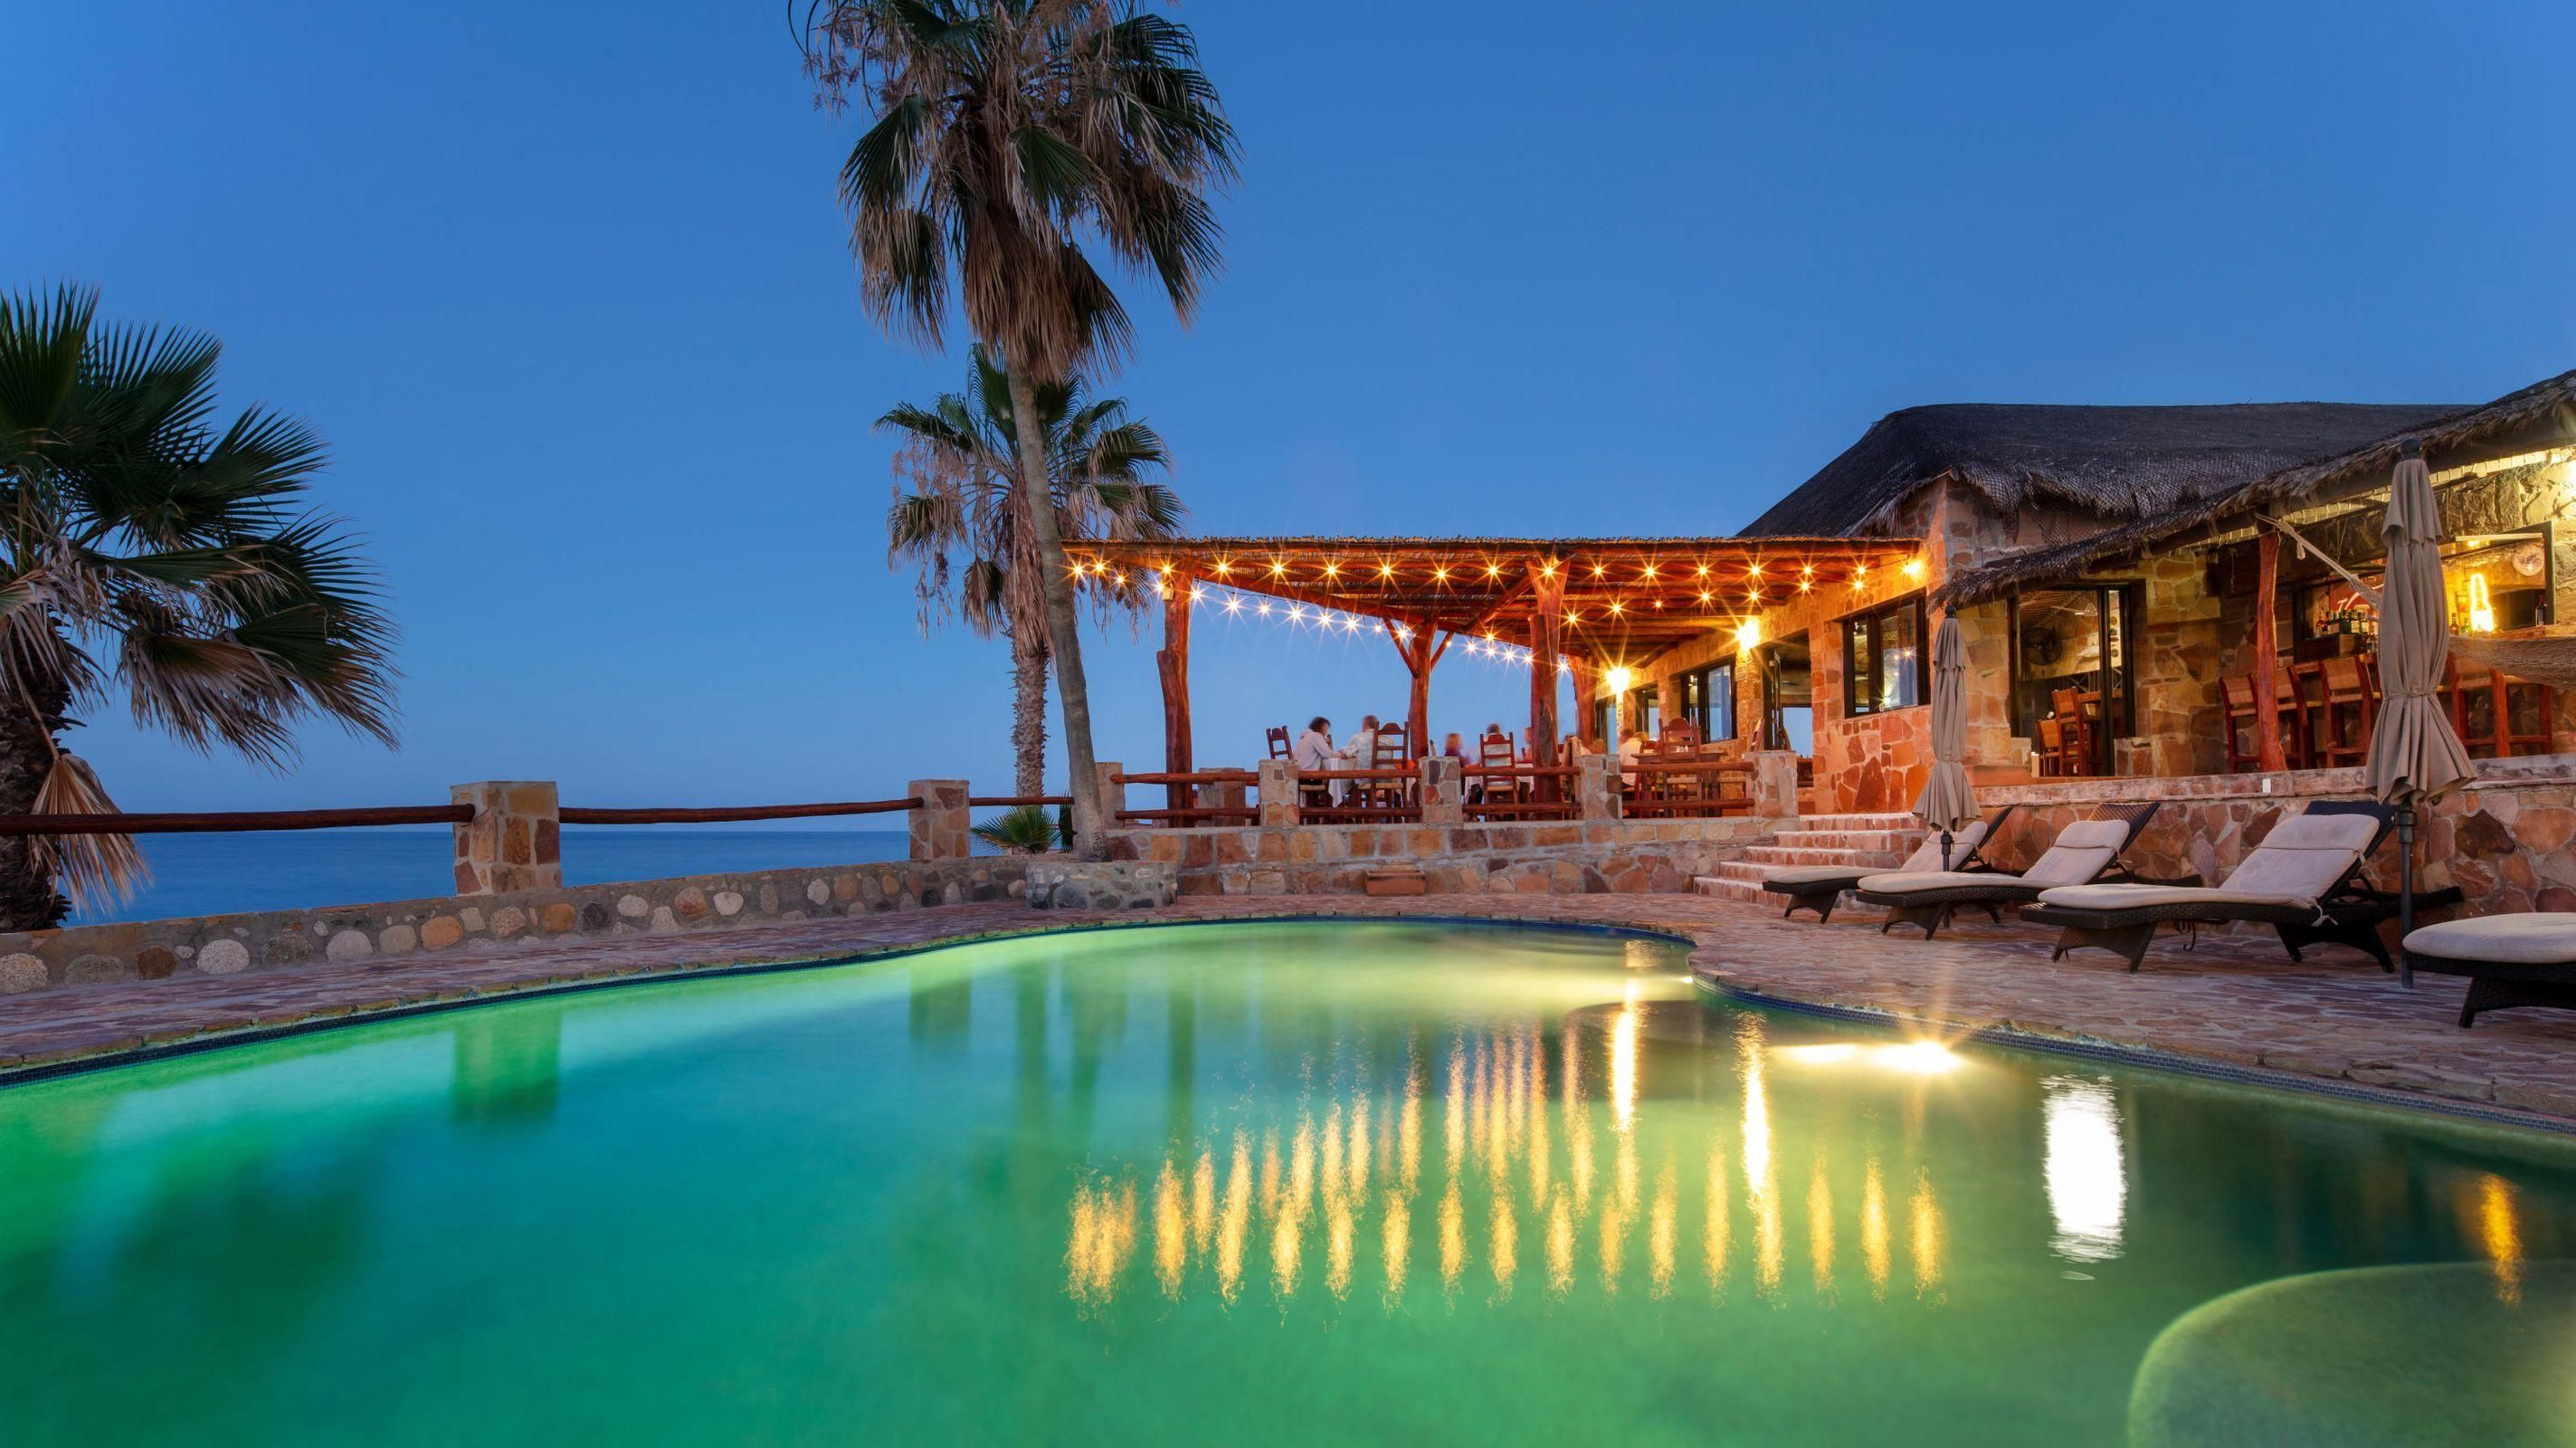 buena vista resort for sale